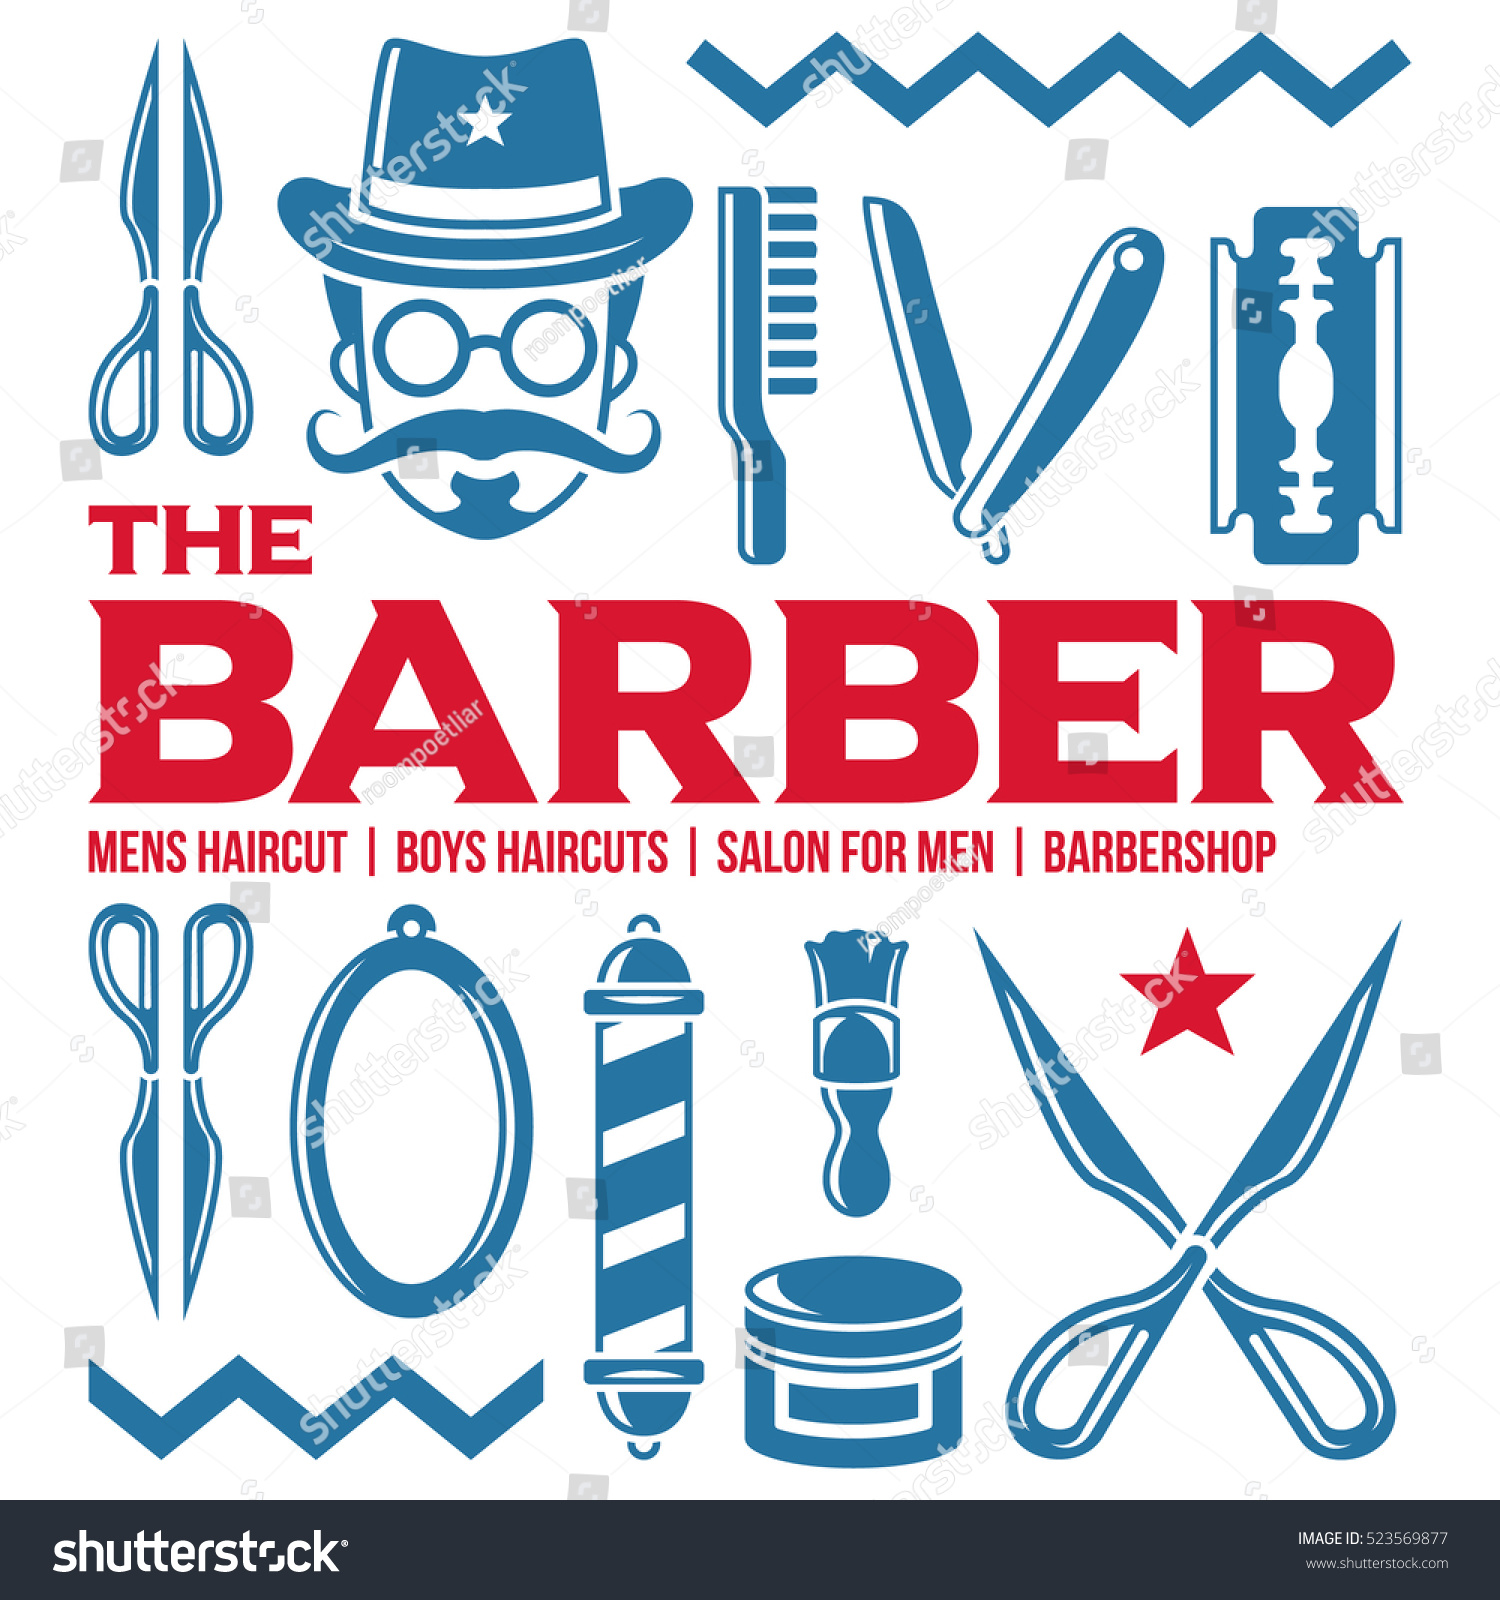 Clip art vector of vintage barber shop logo graphics and icon vector - Vector Set Of Vintage Barber Shop Logo Graphics And Icons Isolated Artwork Object Suitable